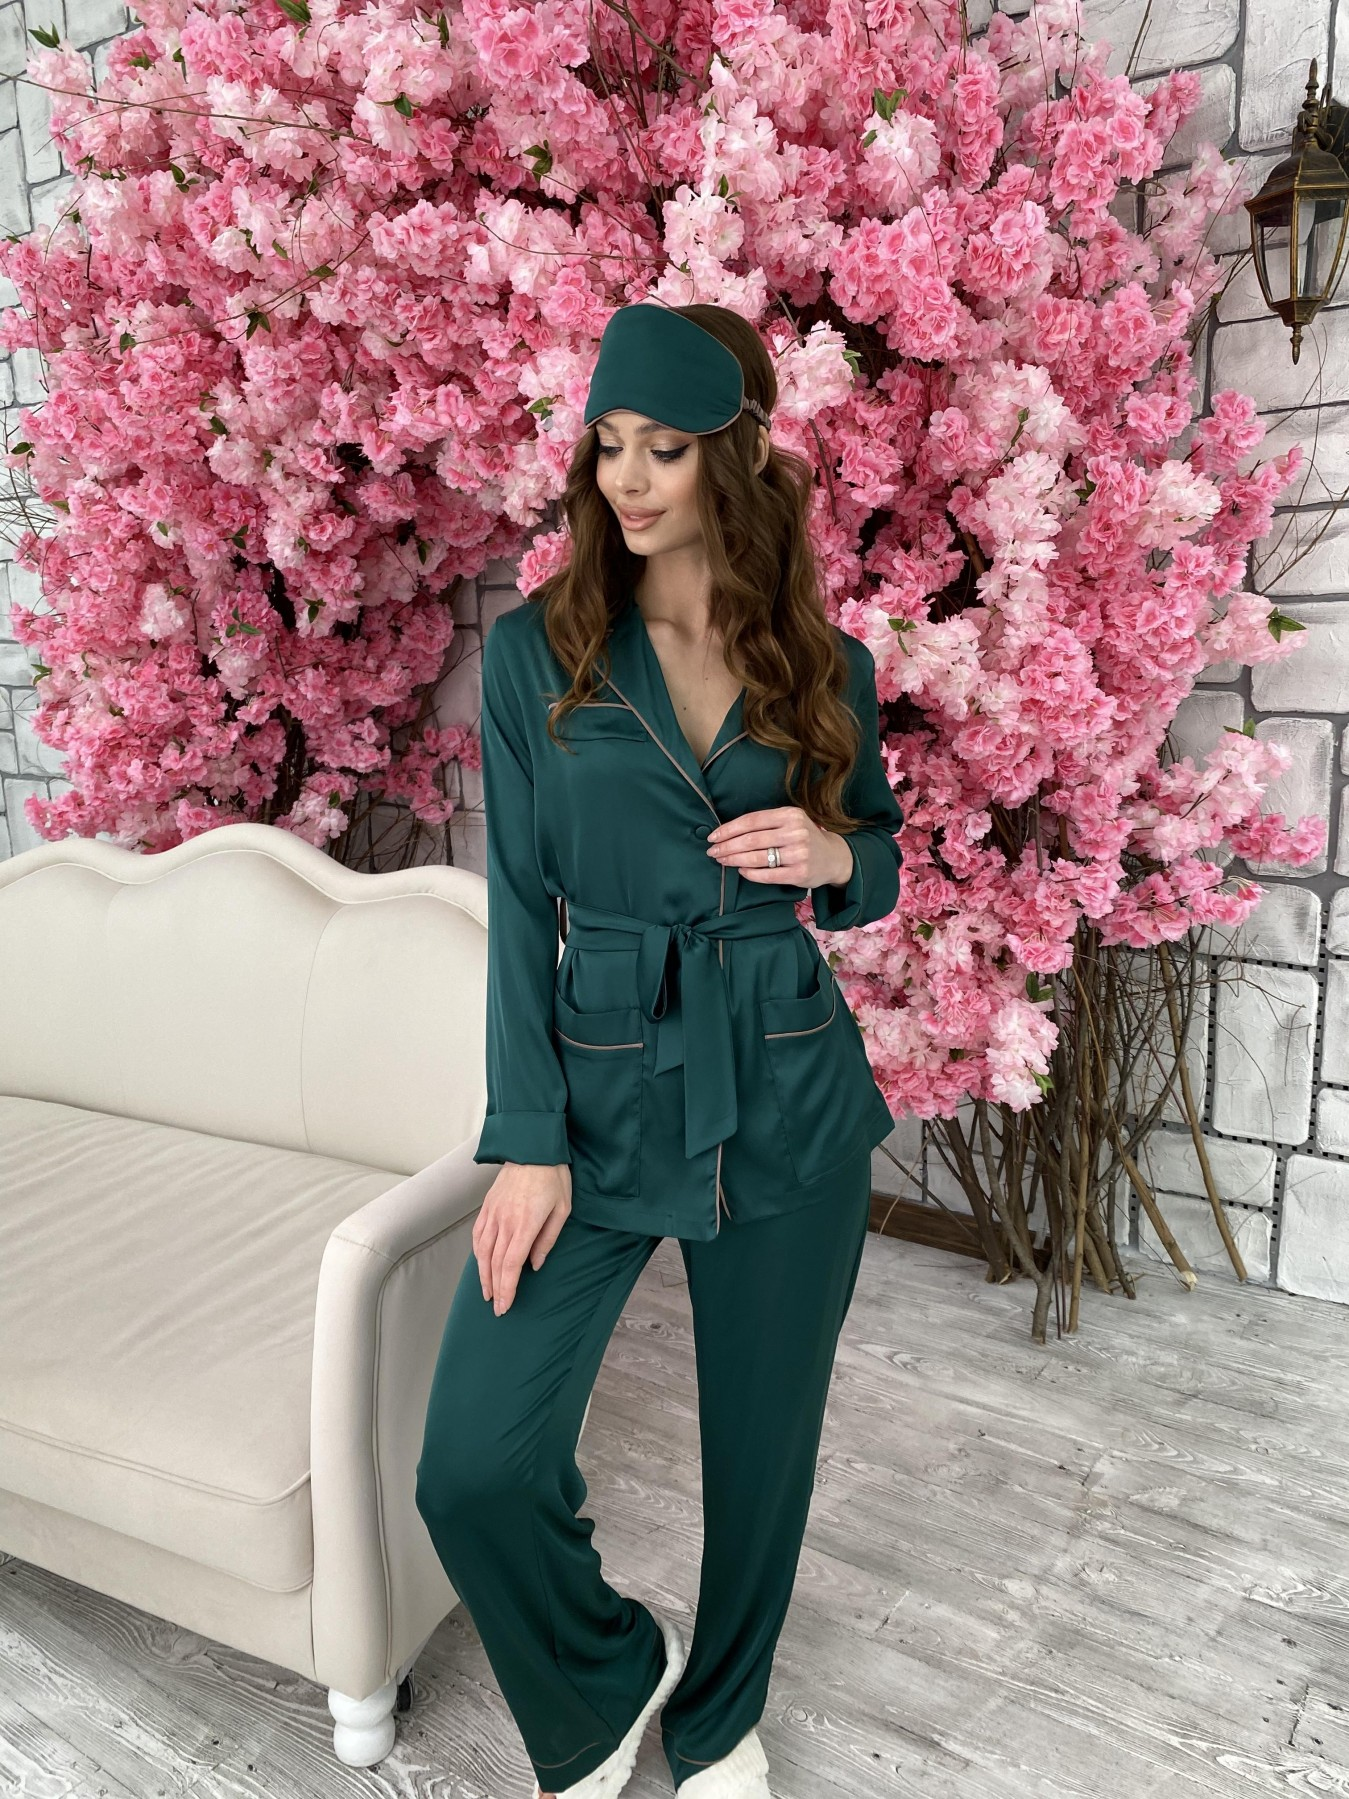 Шайн костюм из шелка  10778 АРТ. 47212 Цвет: Темно зеленый - фото 6, интернет магазин tm-modus.ru